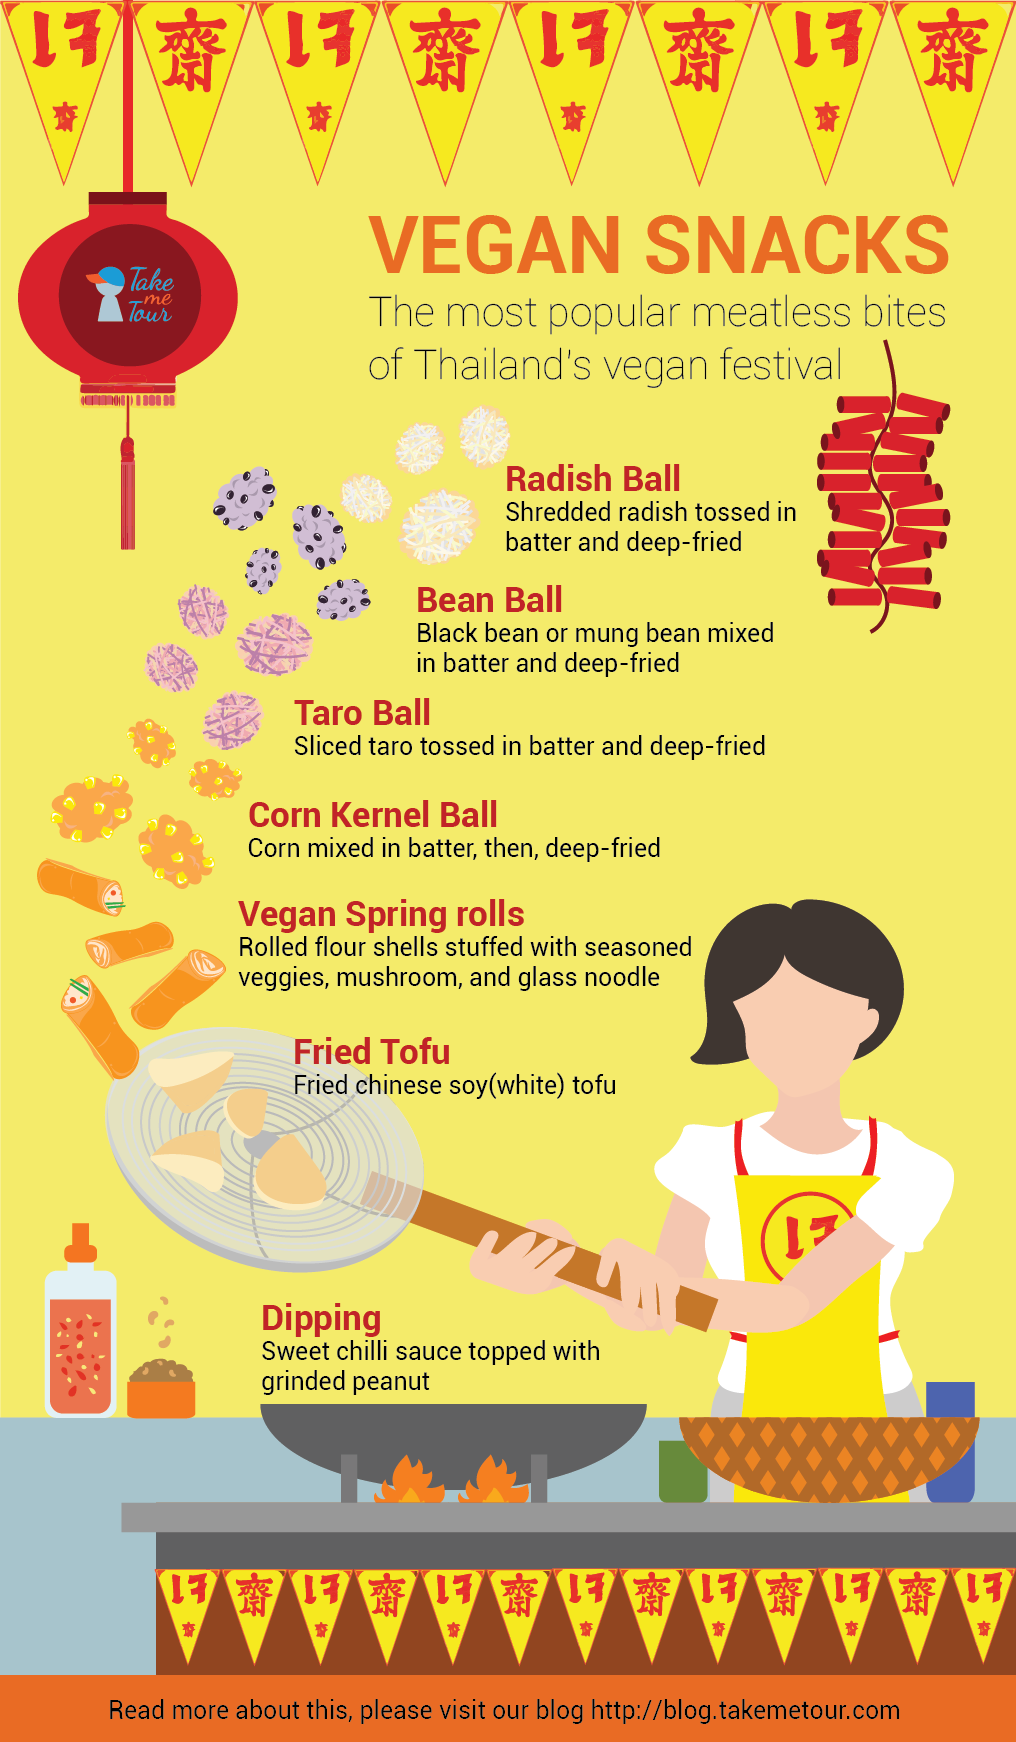 Best Vegan Bites 6 Popular Thai Vegan Snacks At Thailand Vegetarian Festival กรอบ